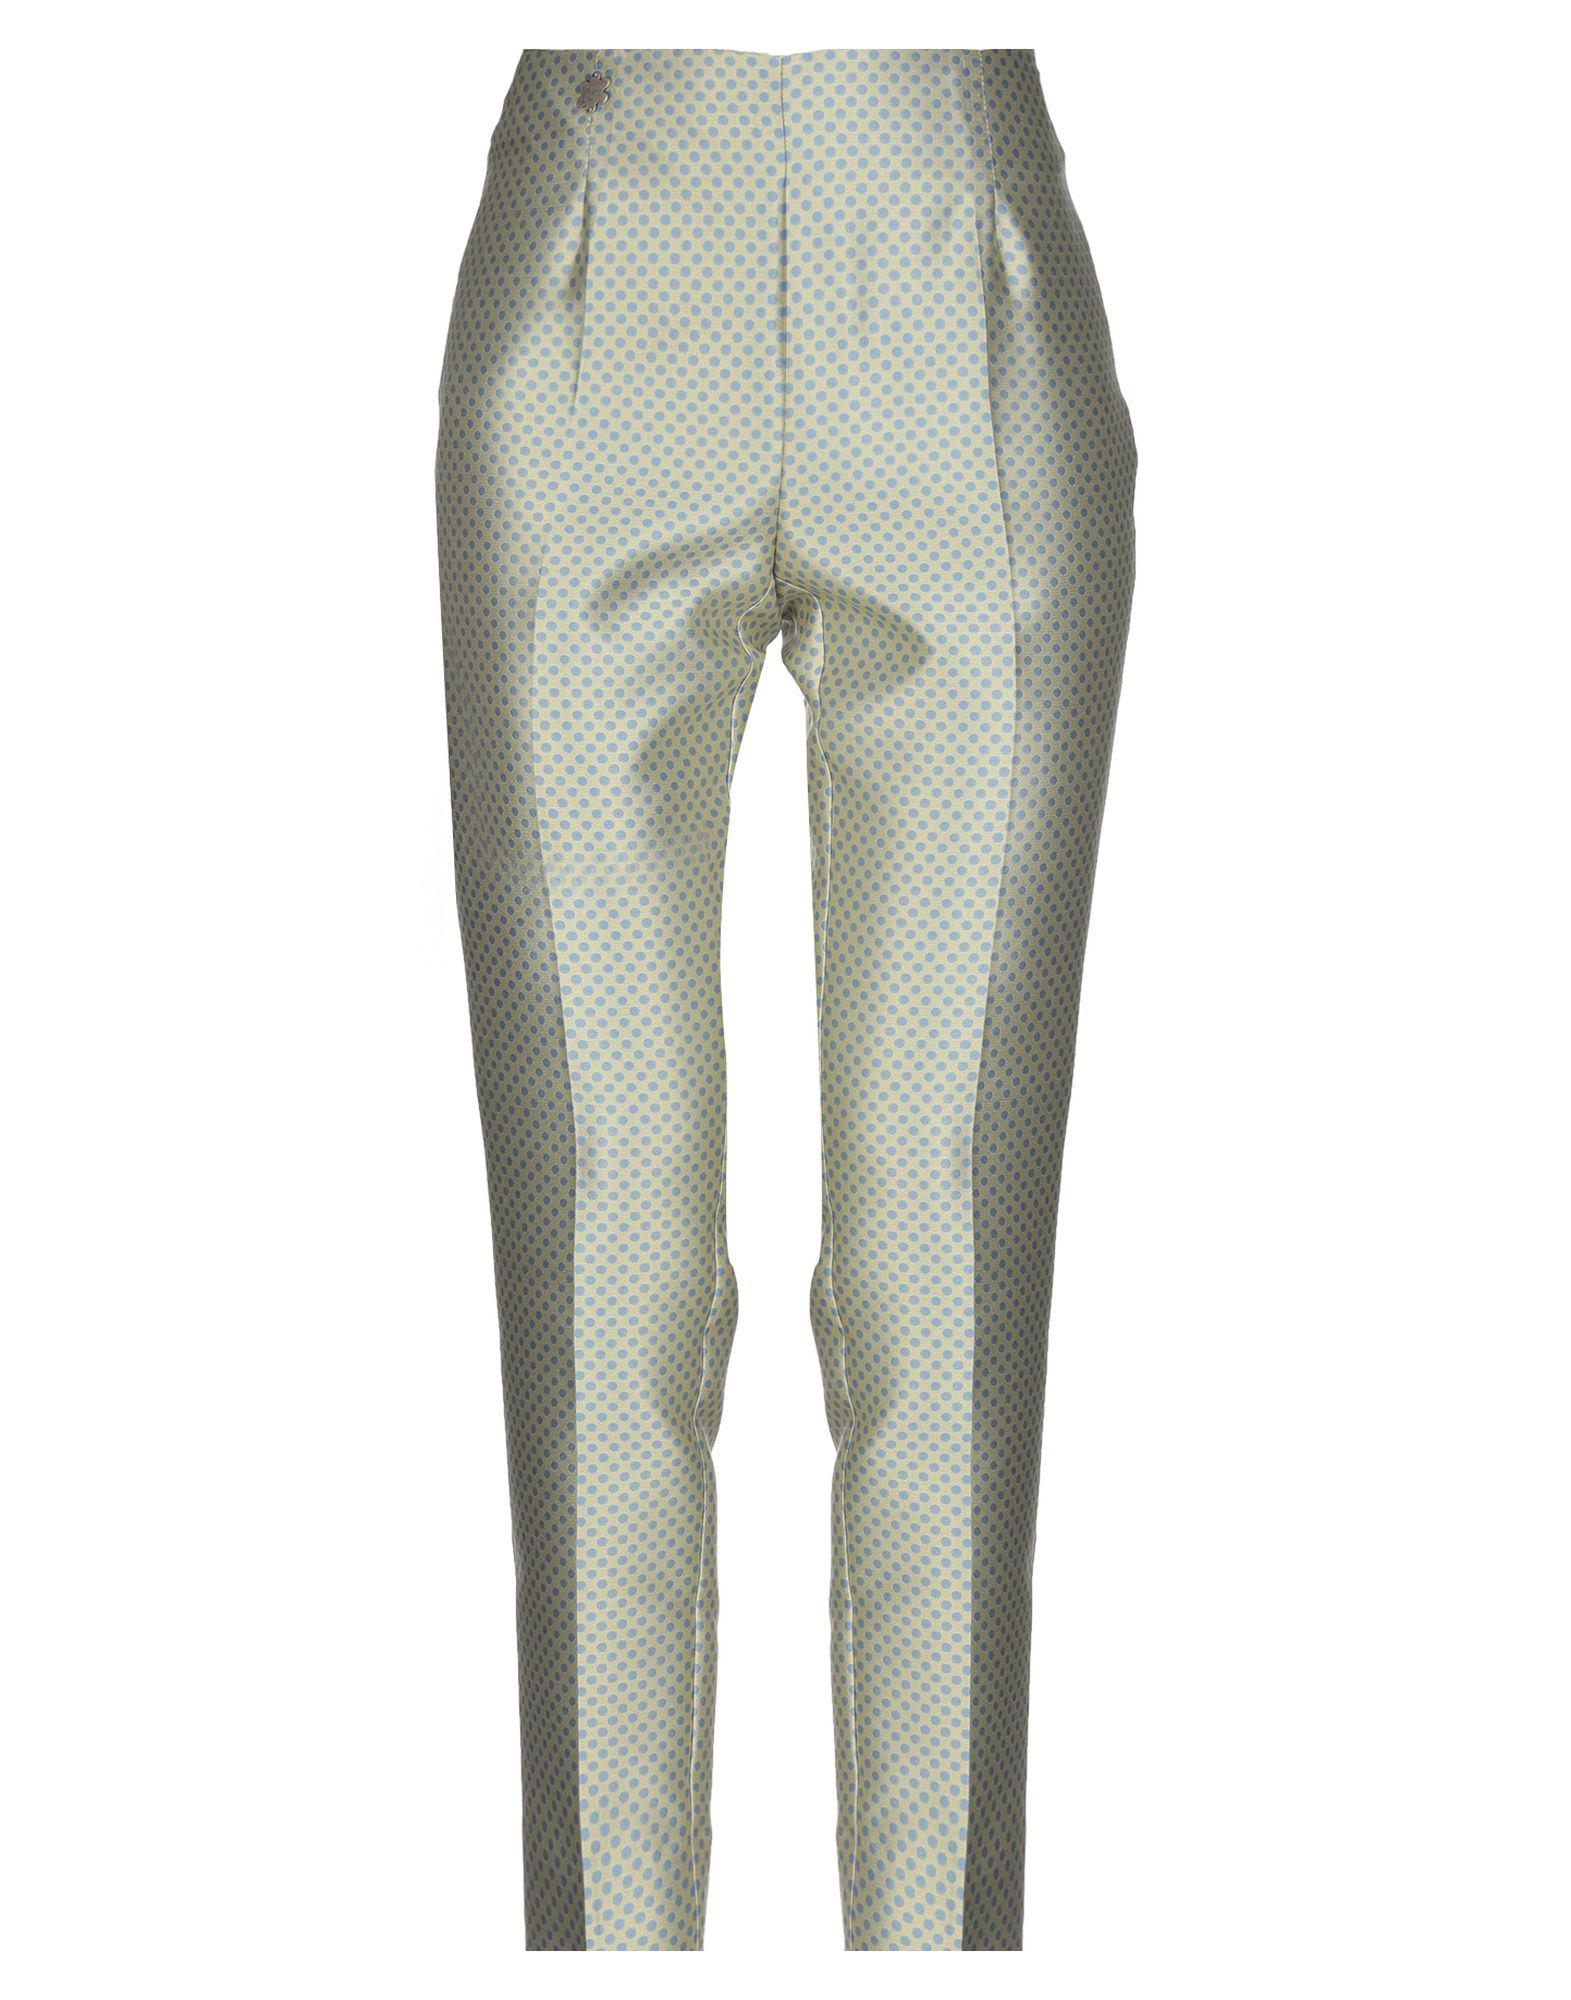 Pantalone Mouche donna donna donna - 13290008OR d40